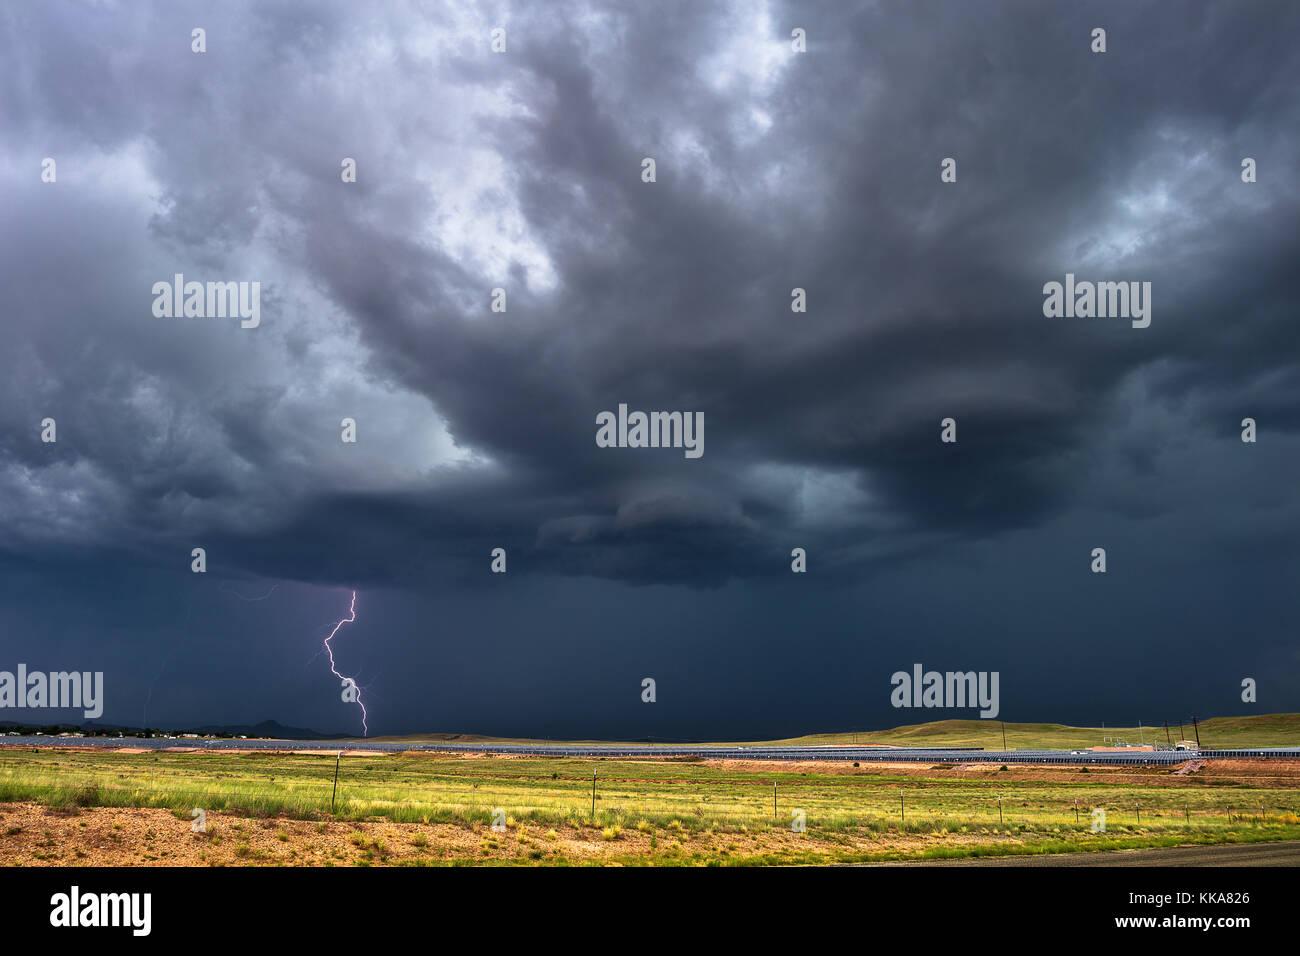 Summer thunderstorm with lightning and dark clouds near Chino Valley, Arizona, USA. Stock Photo